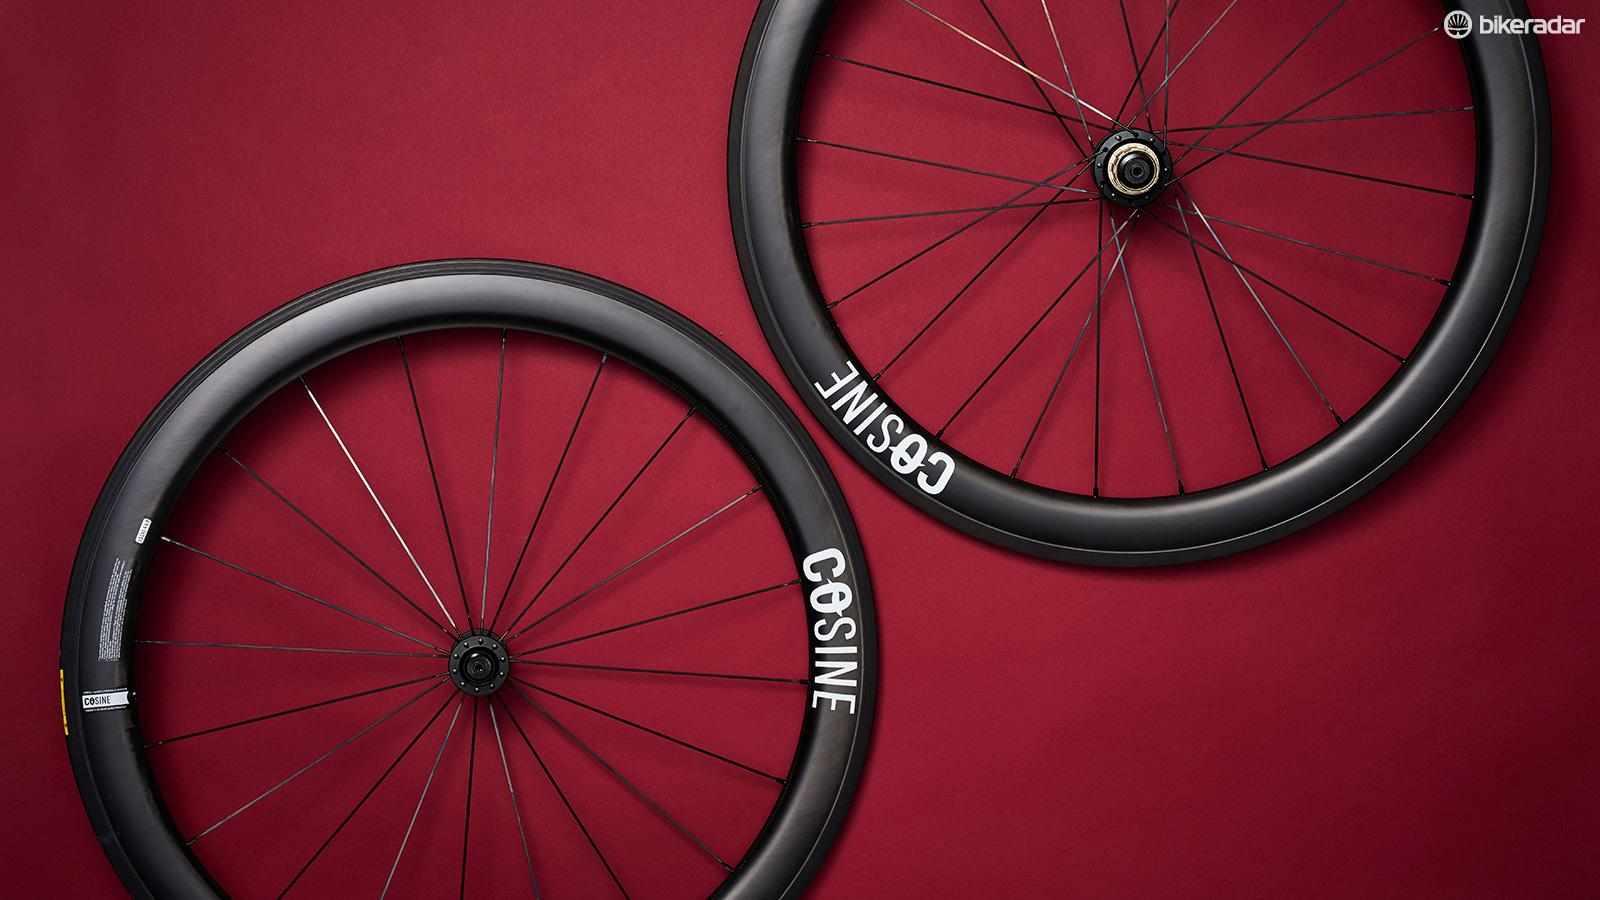 The Cosine Carbon Clincher wheelset